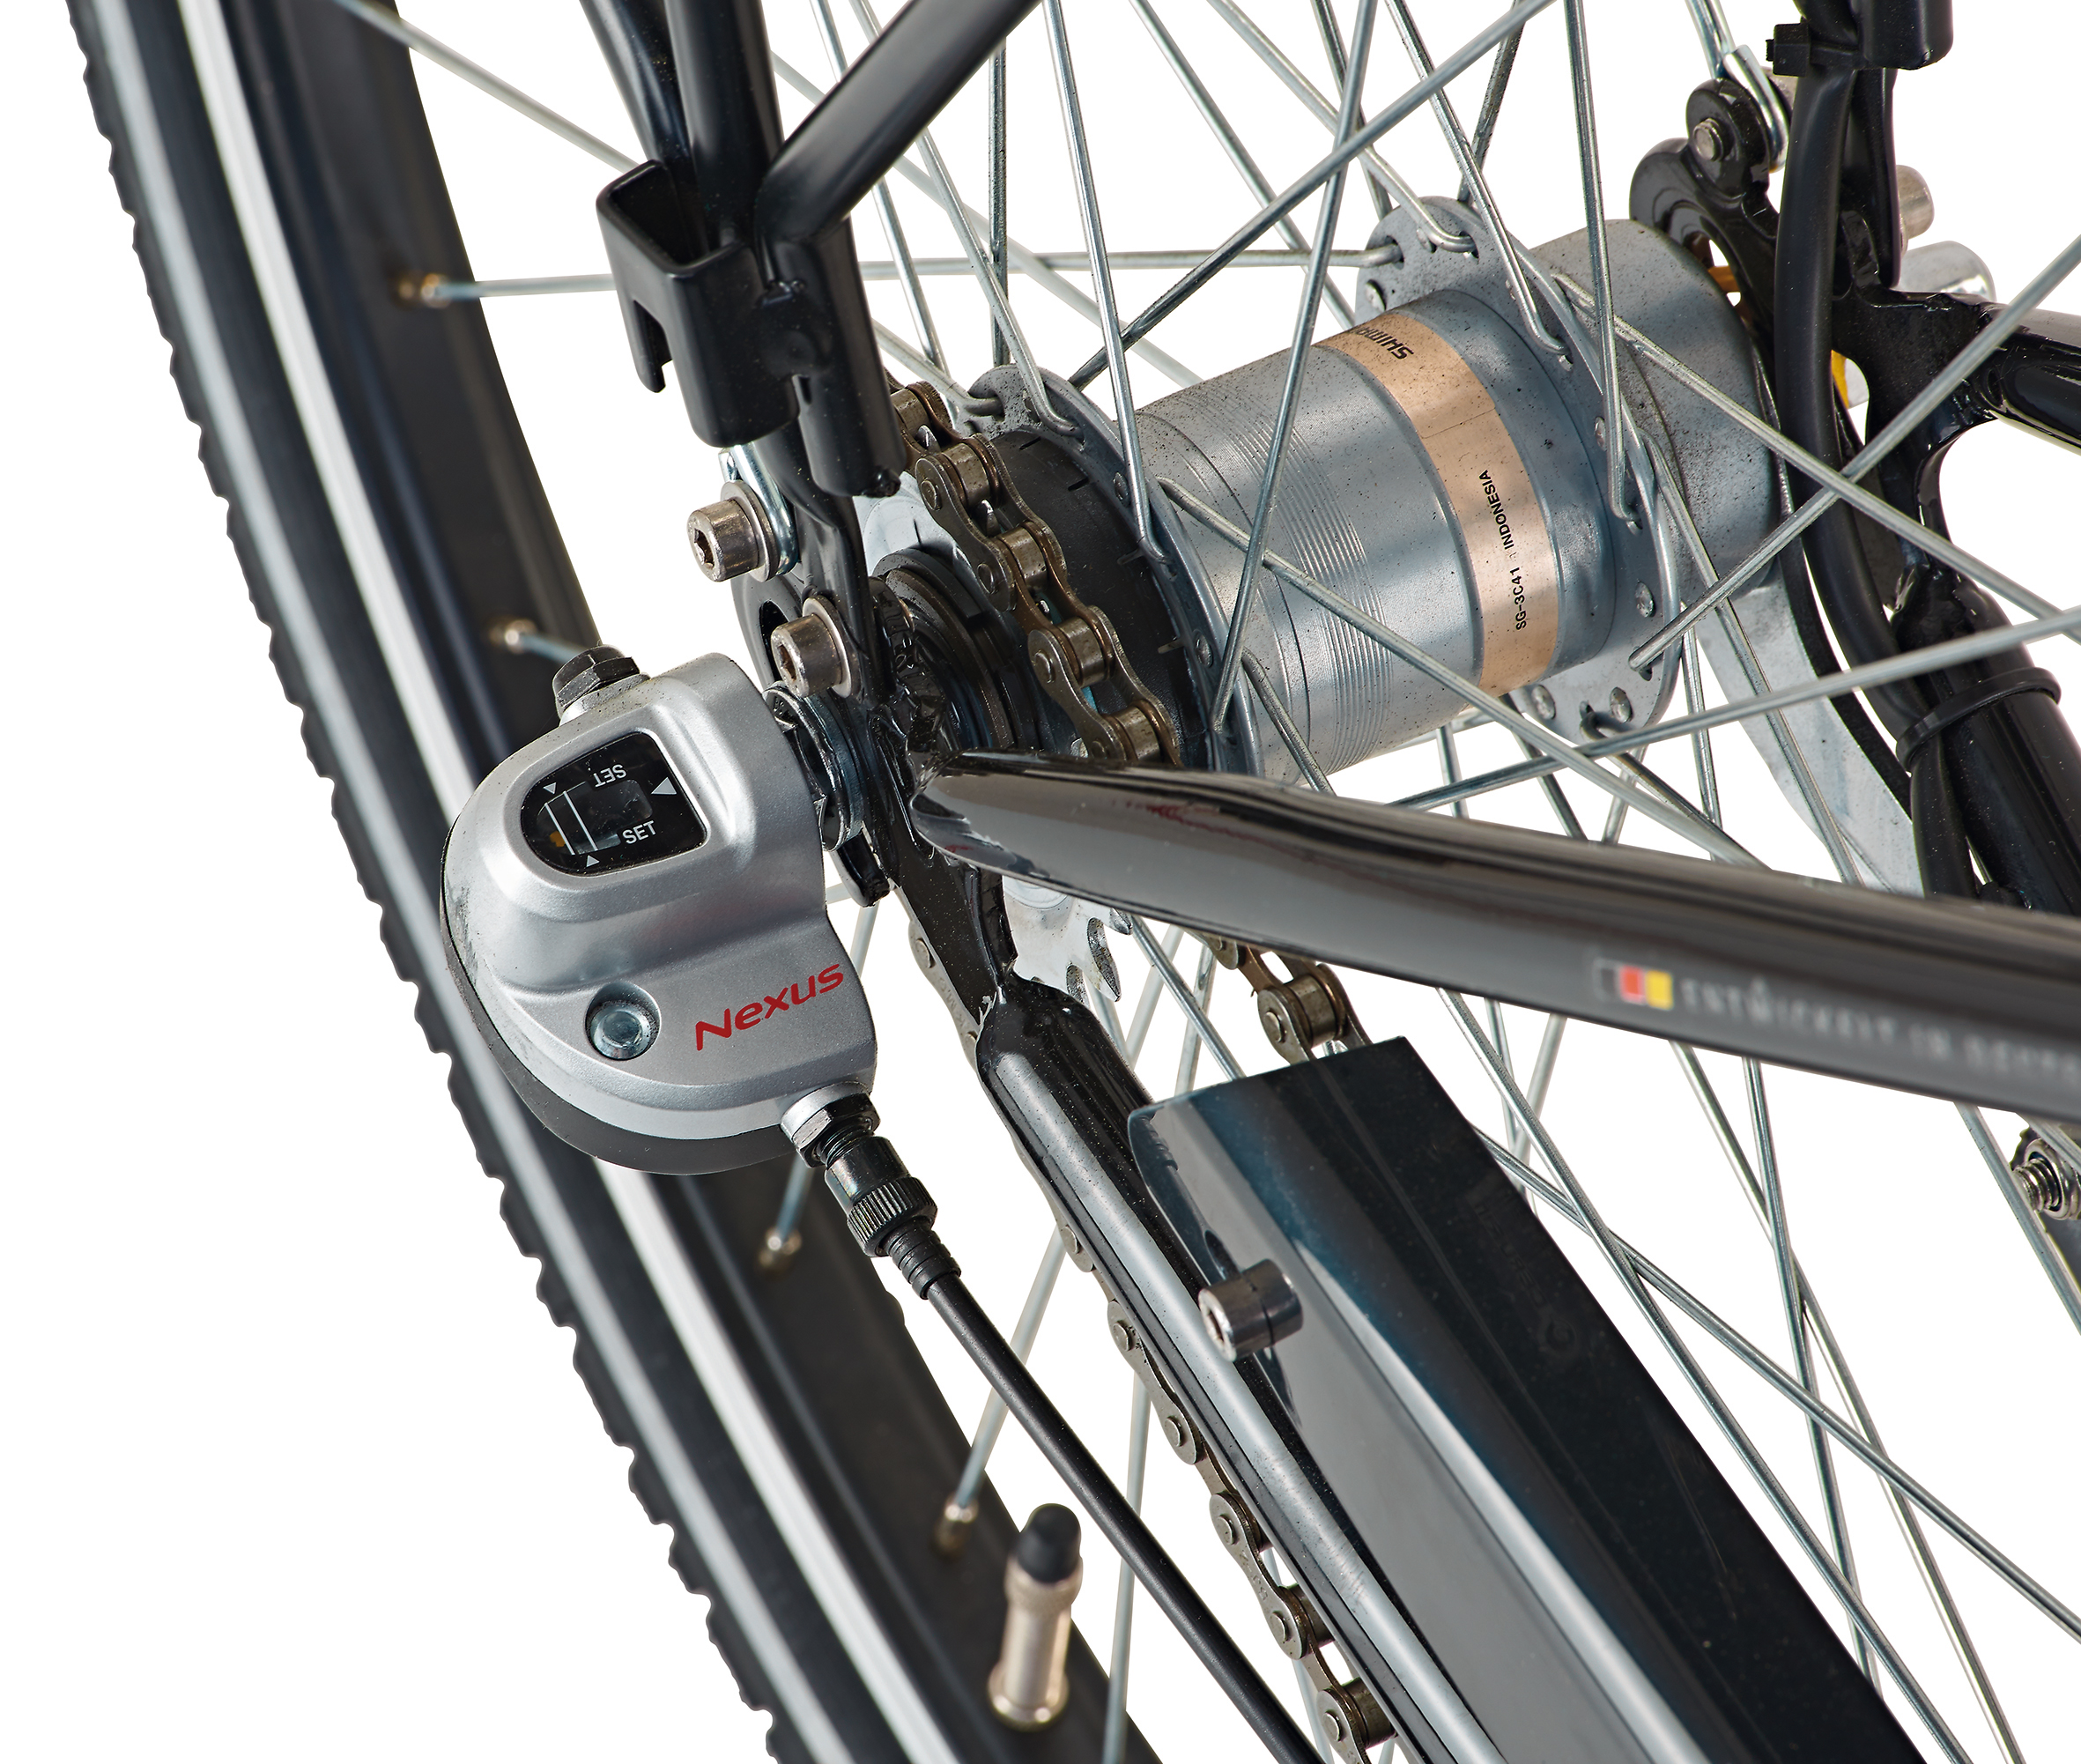 "Prophete Fahrrad / Cityrad Geniesser 9.4 City Bike 26"" Tiefeinstieg Bild 4"